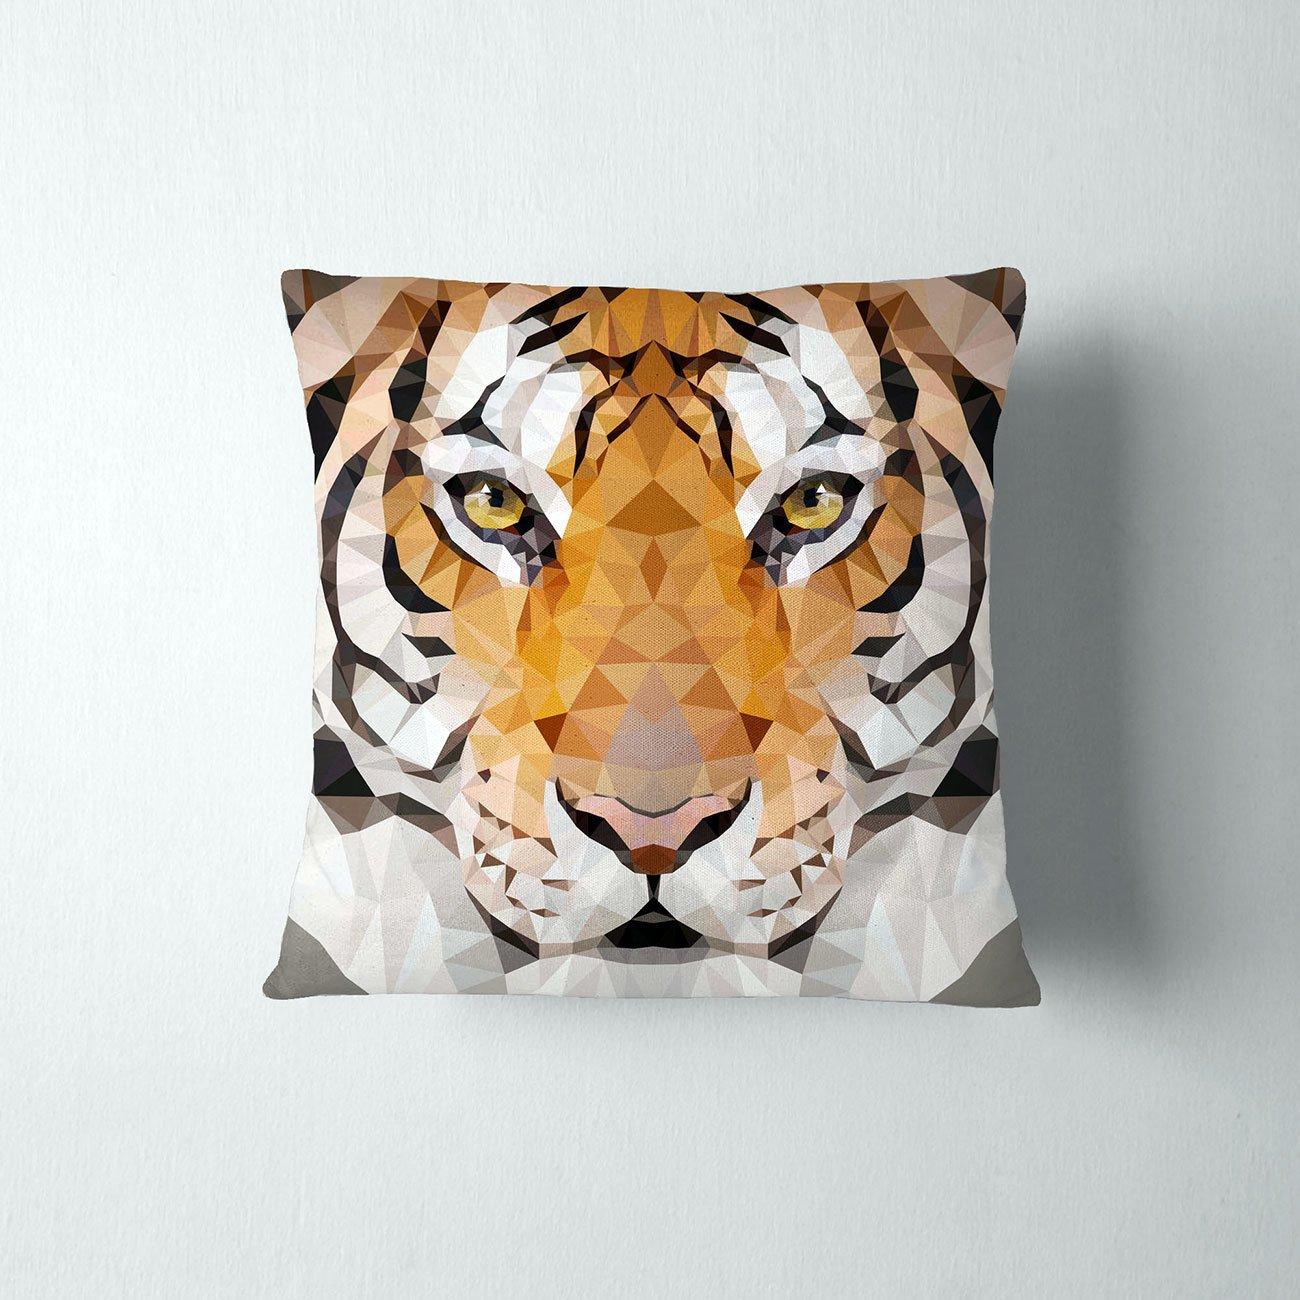 Photo 1 of 1 in Geometric Cat Pillowcases